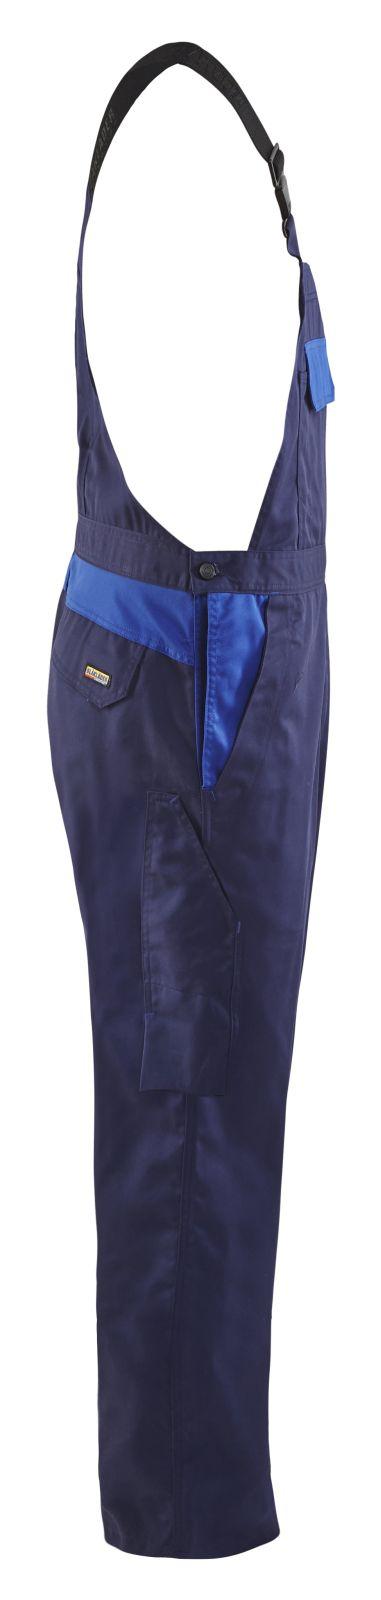 Blaklader Amerikaanse overalls 26641800 marineblauw-korenblauw(8985)